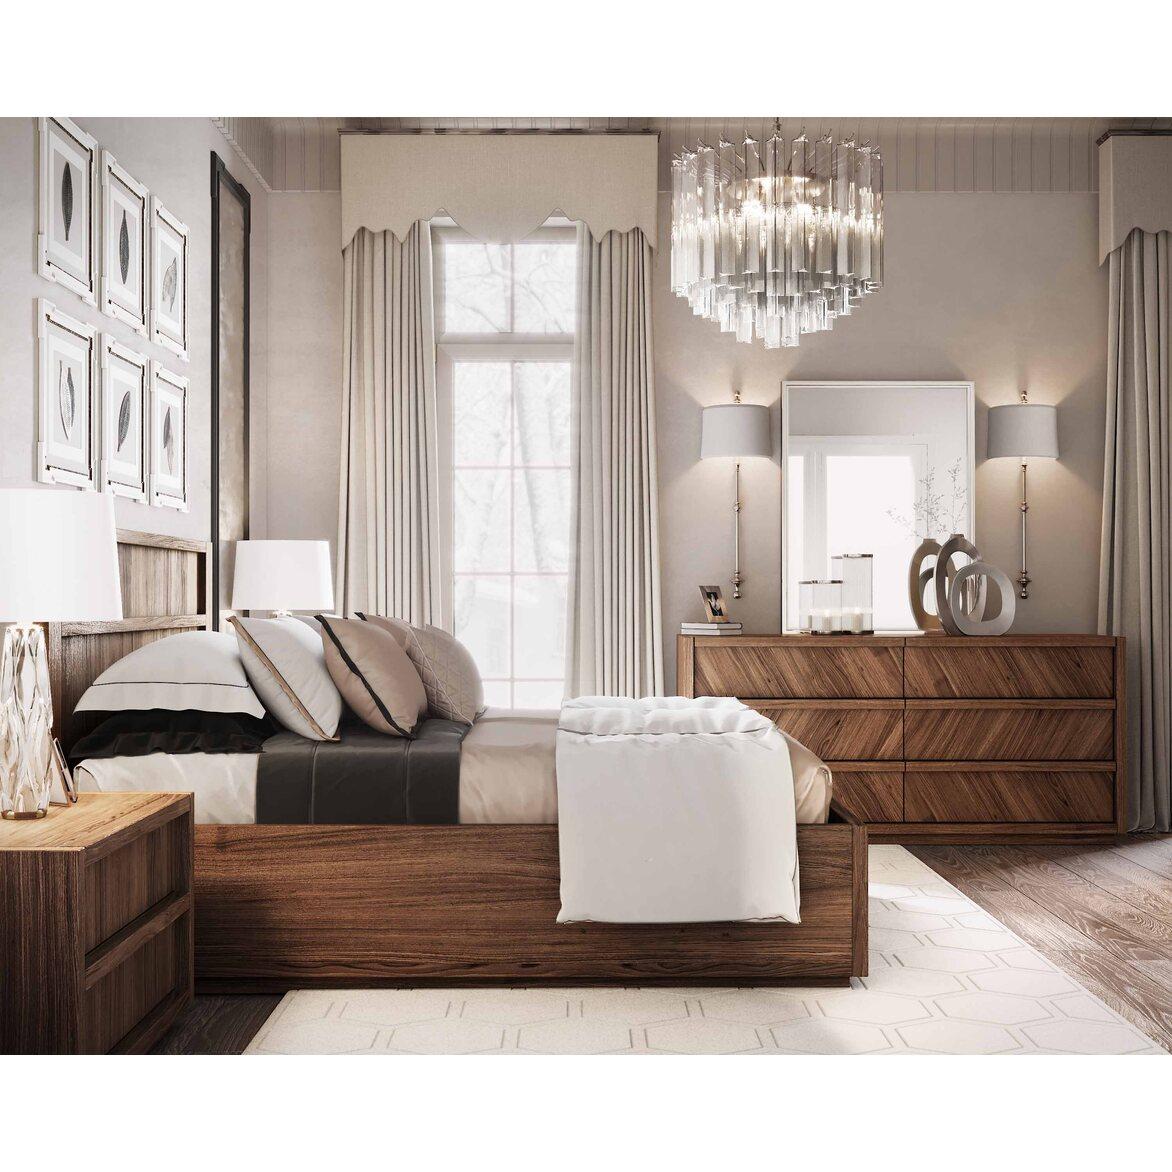 "Кровать 180*200 ""Brenson"" 6 | Двуспальные кровати Kingsby"